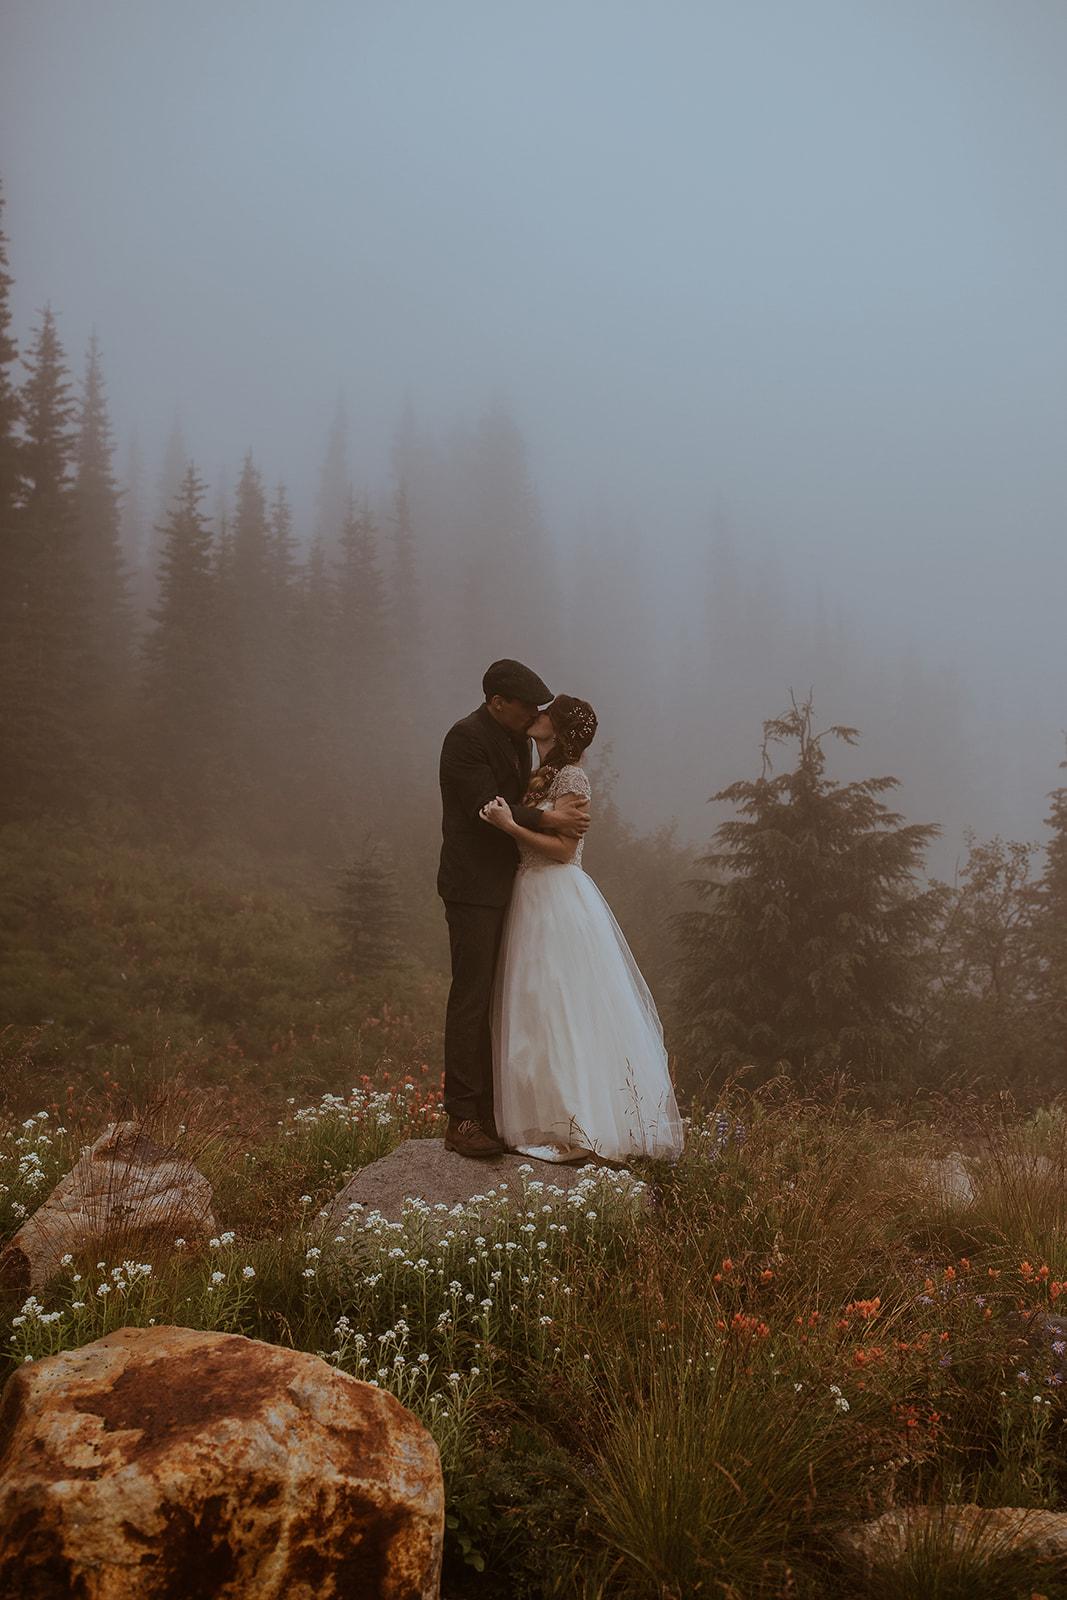 mount-rainier-cabin-elopement-megan-gallagher-photography_(377_of_568).jpg